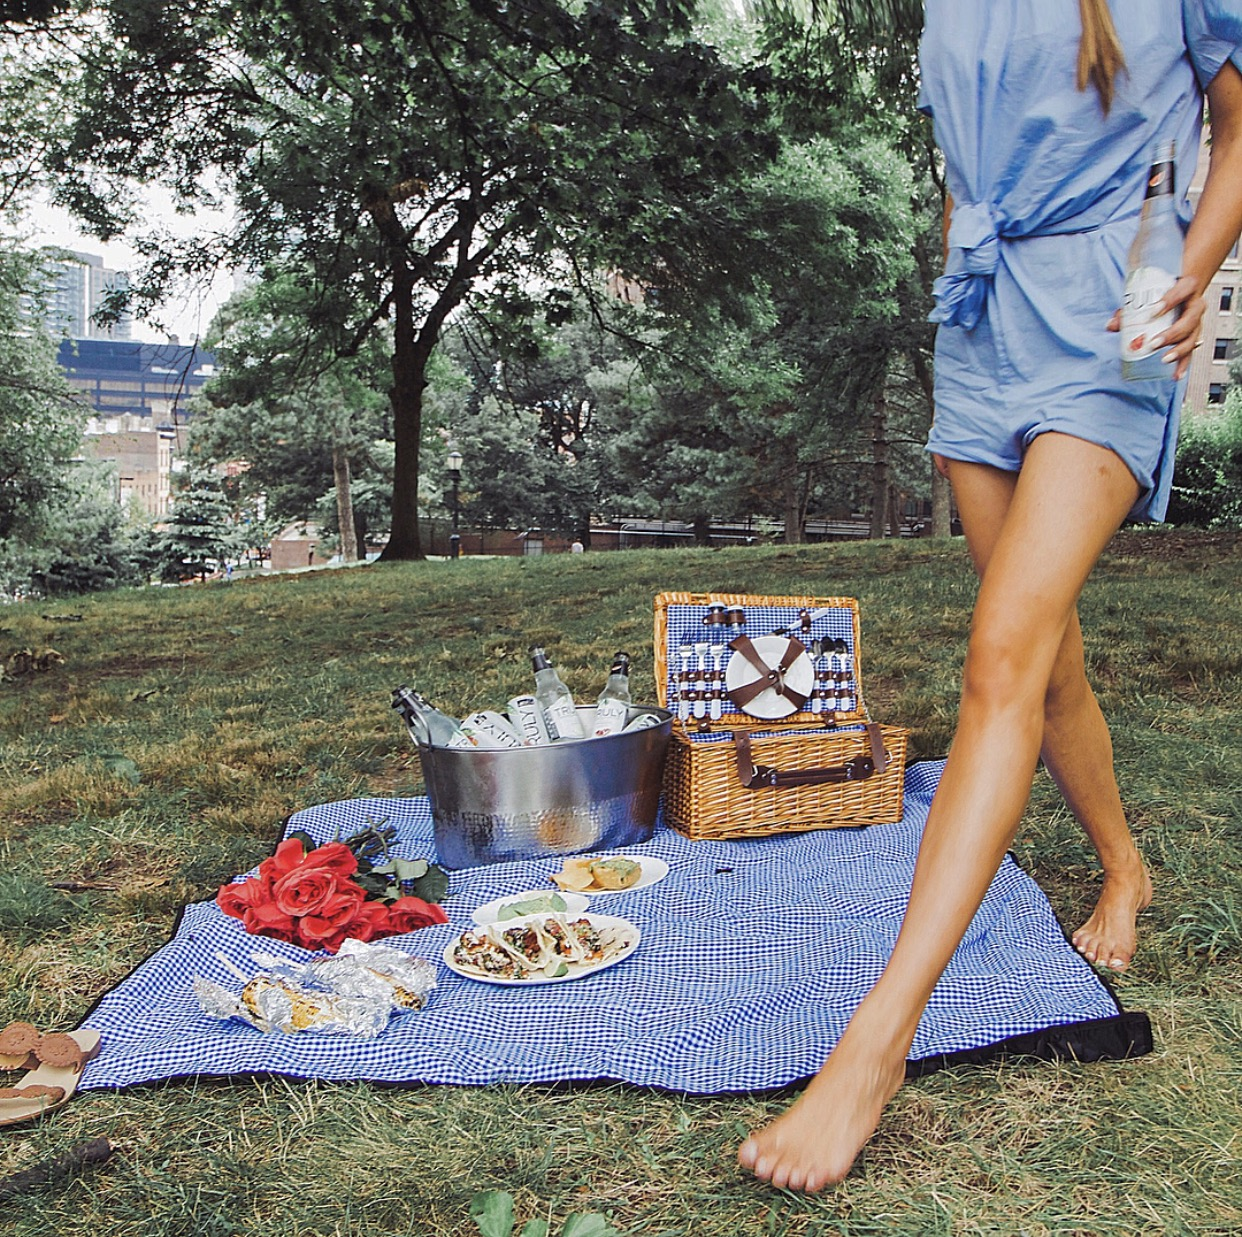 summer ideas, date ideas, summer love, picnic, gingham, picnic basket